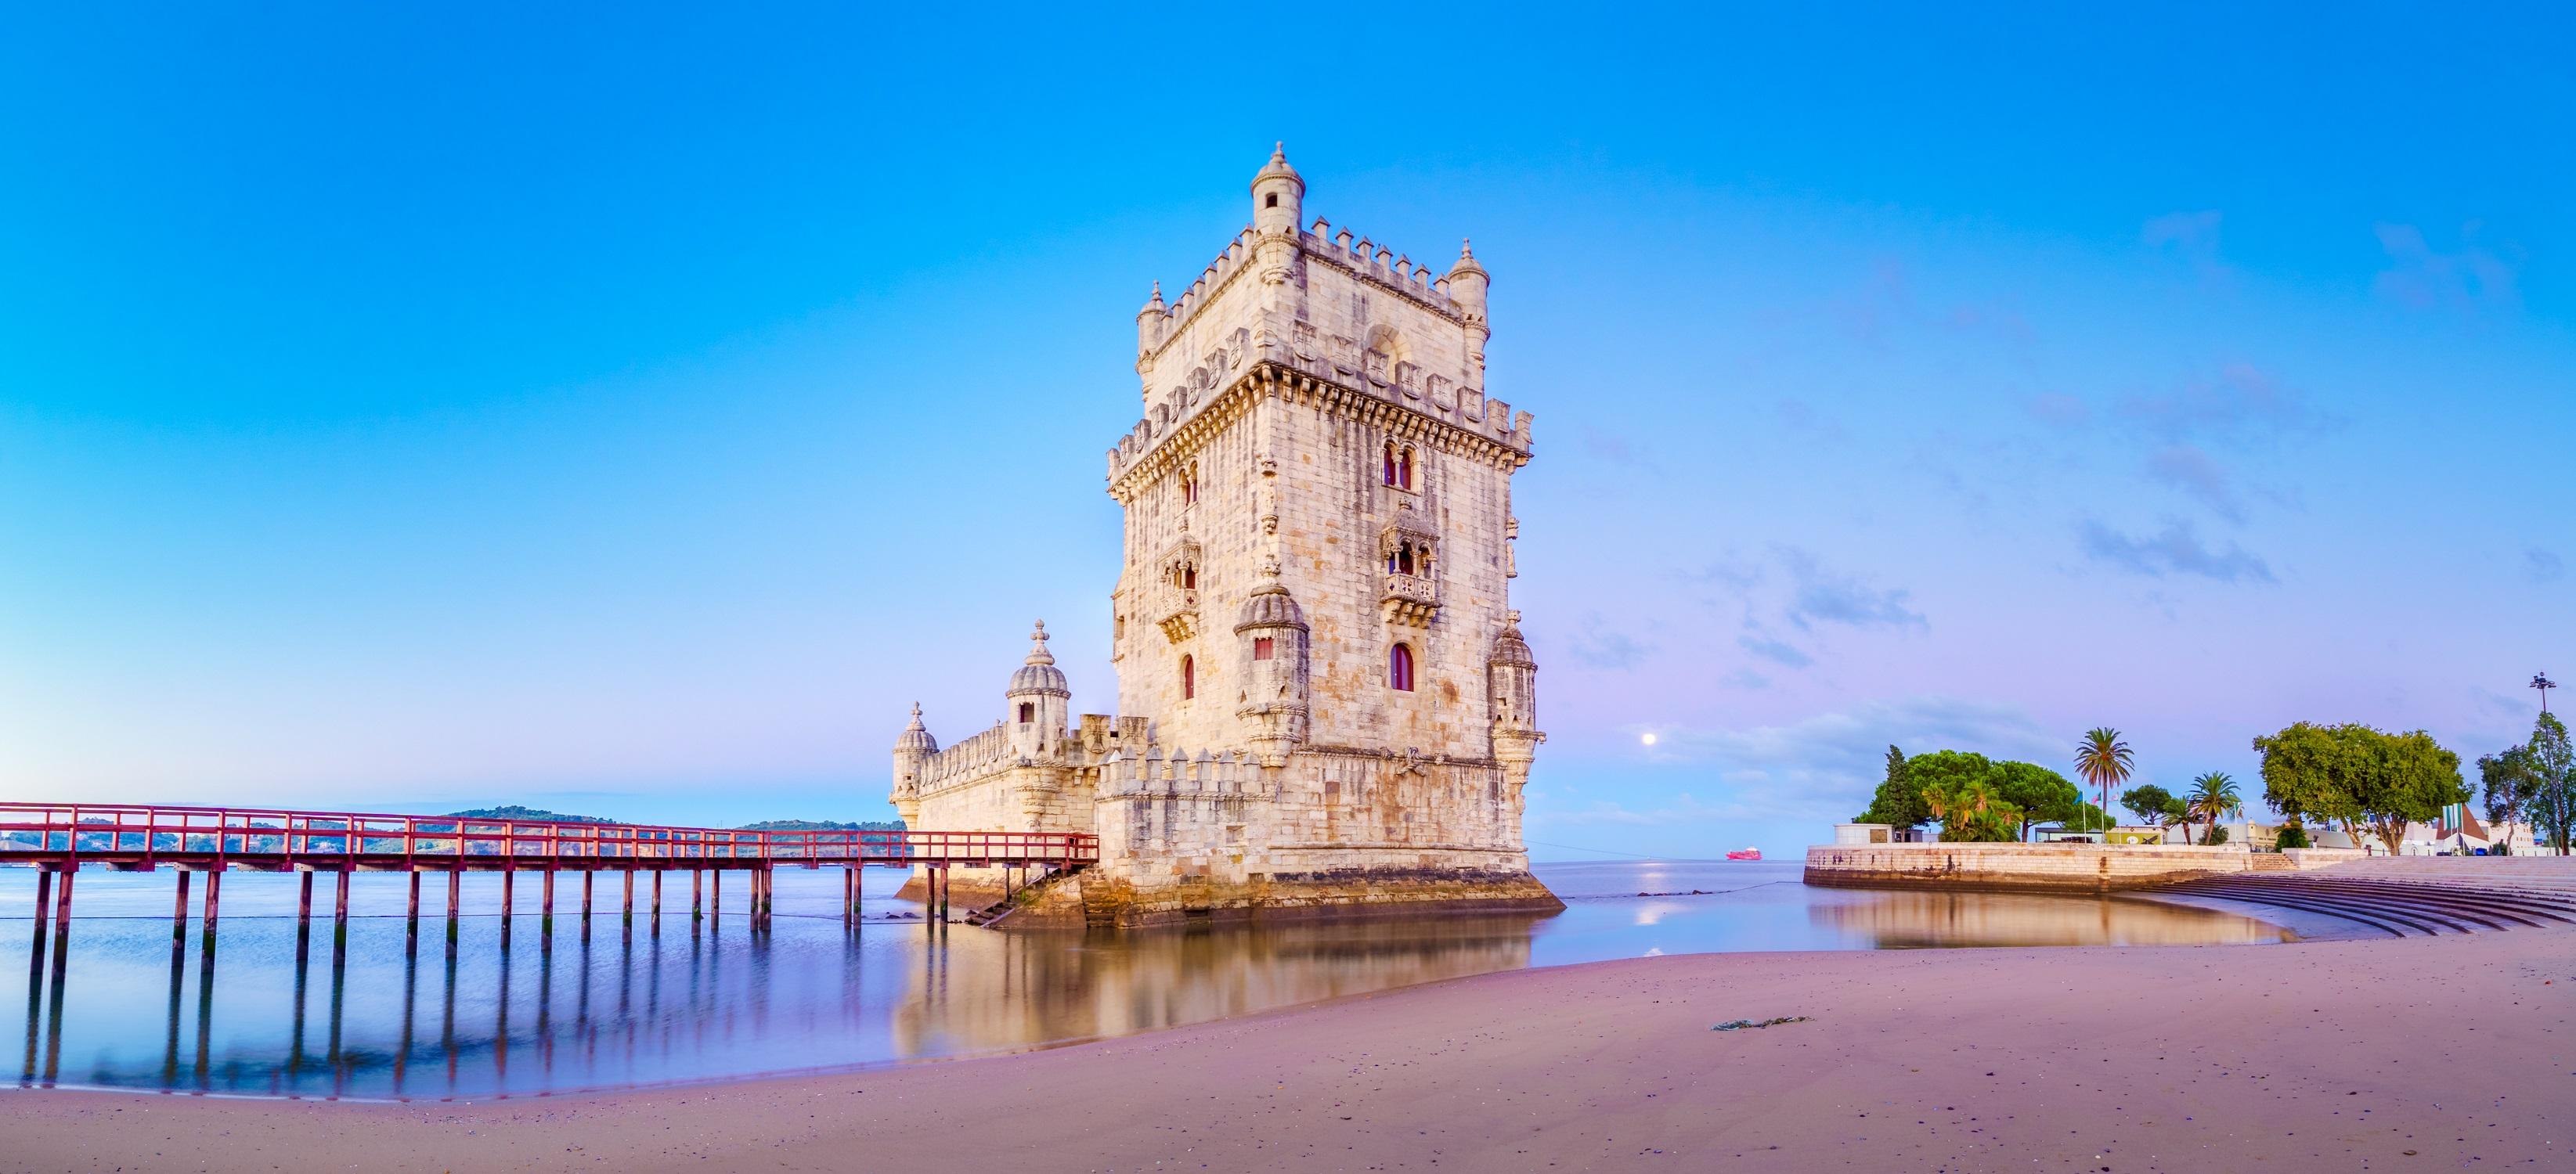 Turm von Belém, Portugal